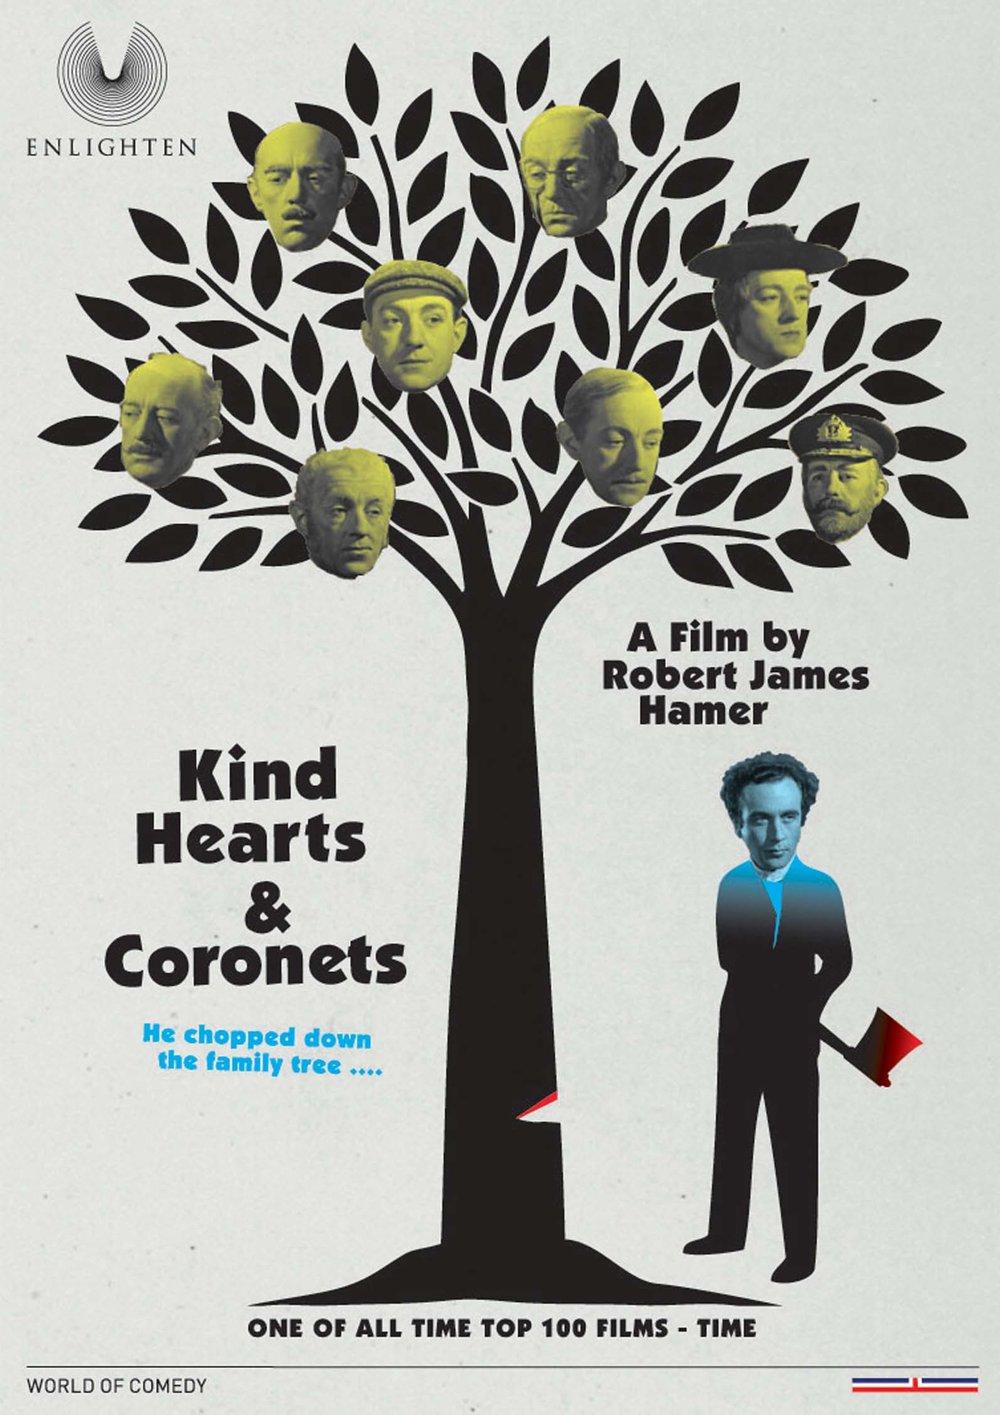 KindHearts&Coronets.jpg